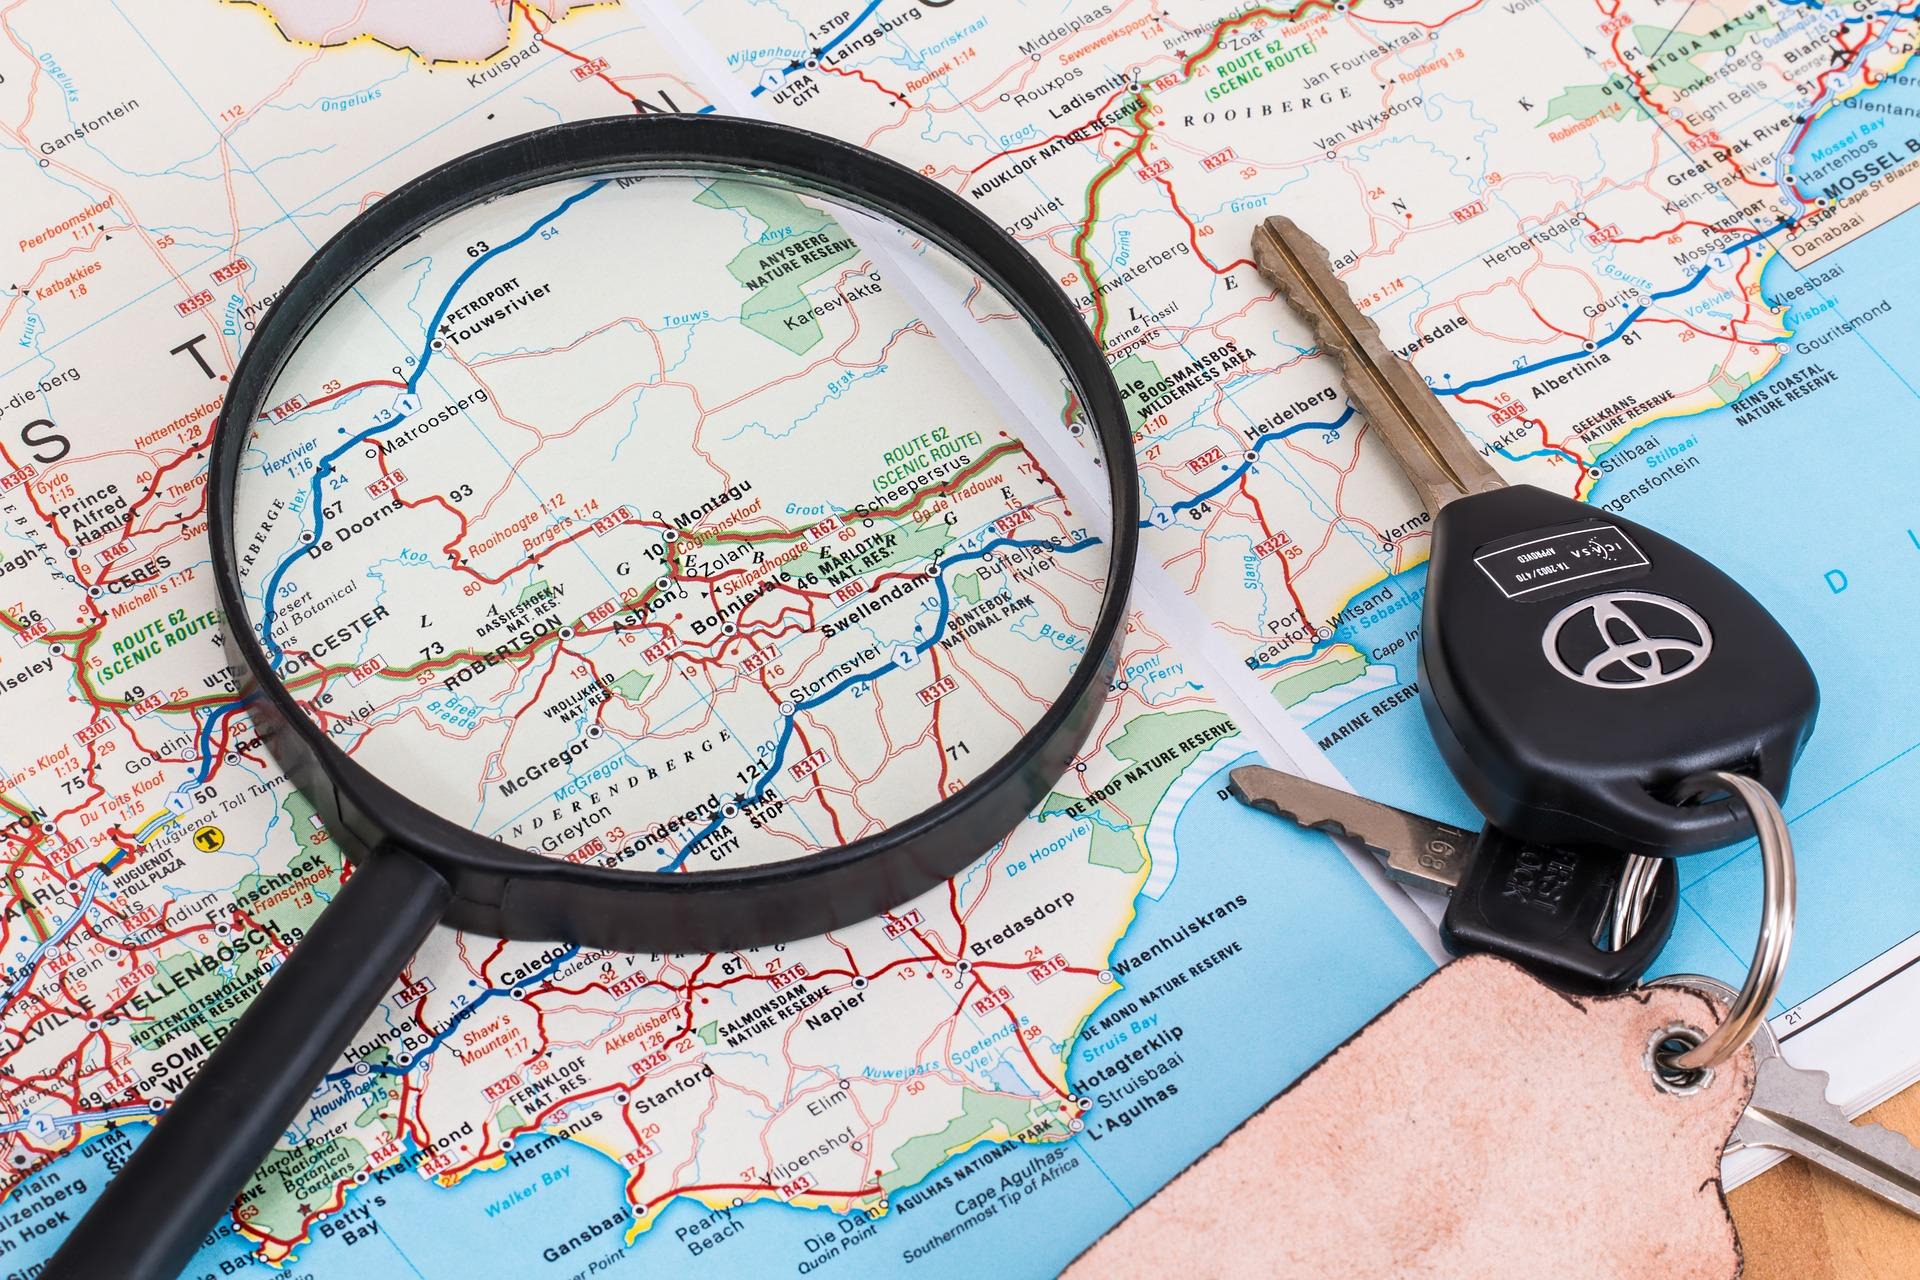 Planning3 - كيف تنسق برنامجاً سياحياً ناجحاً